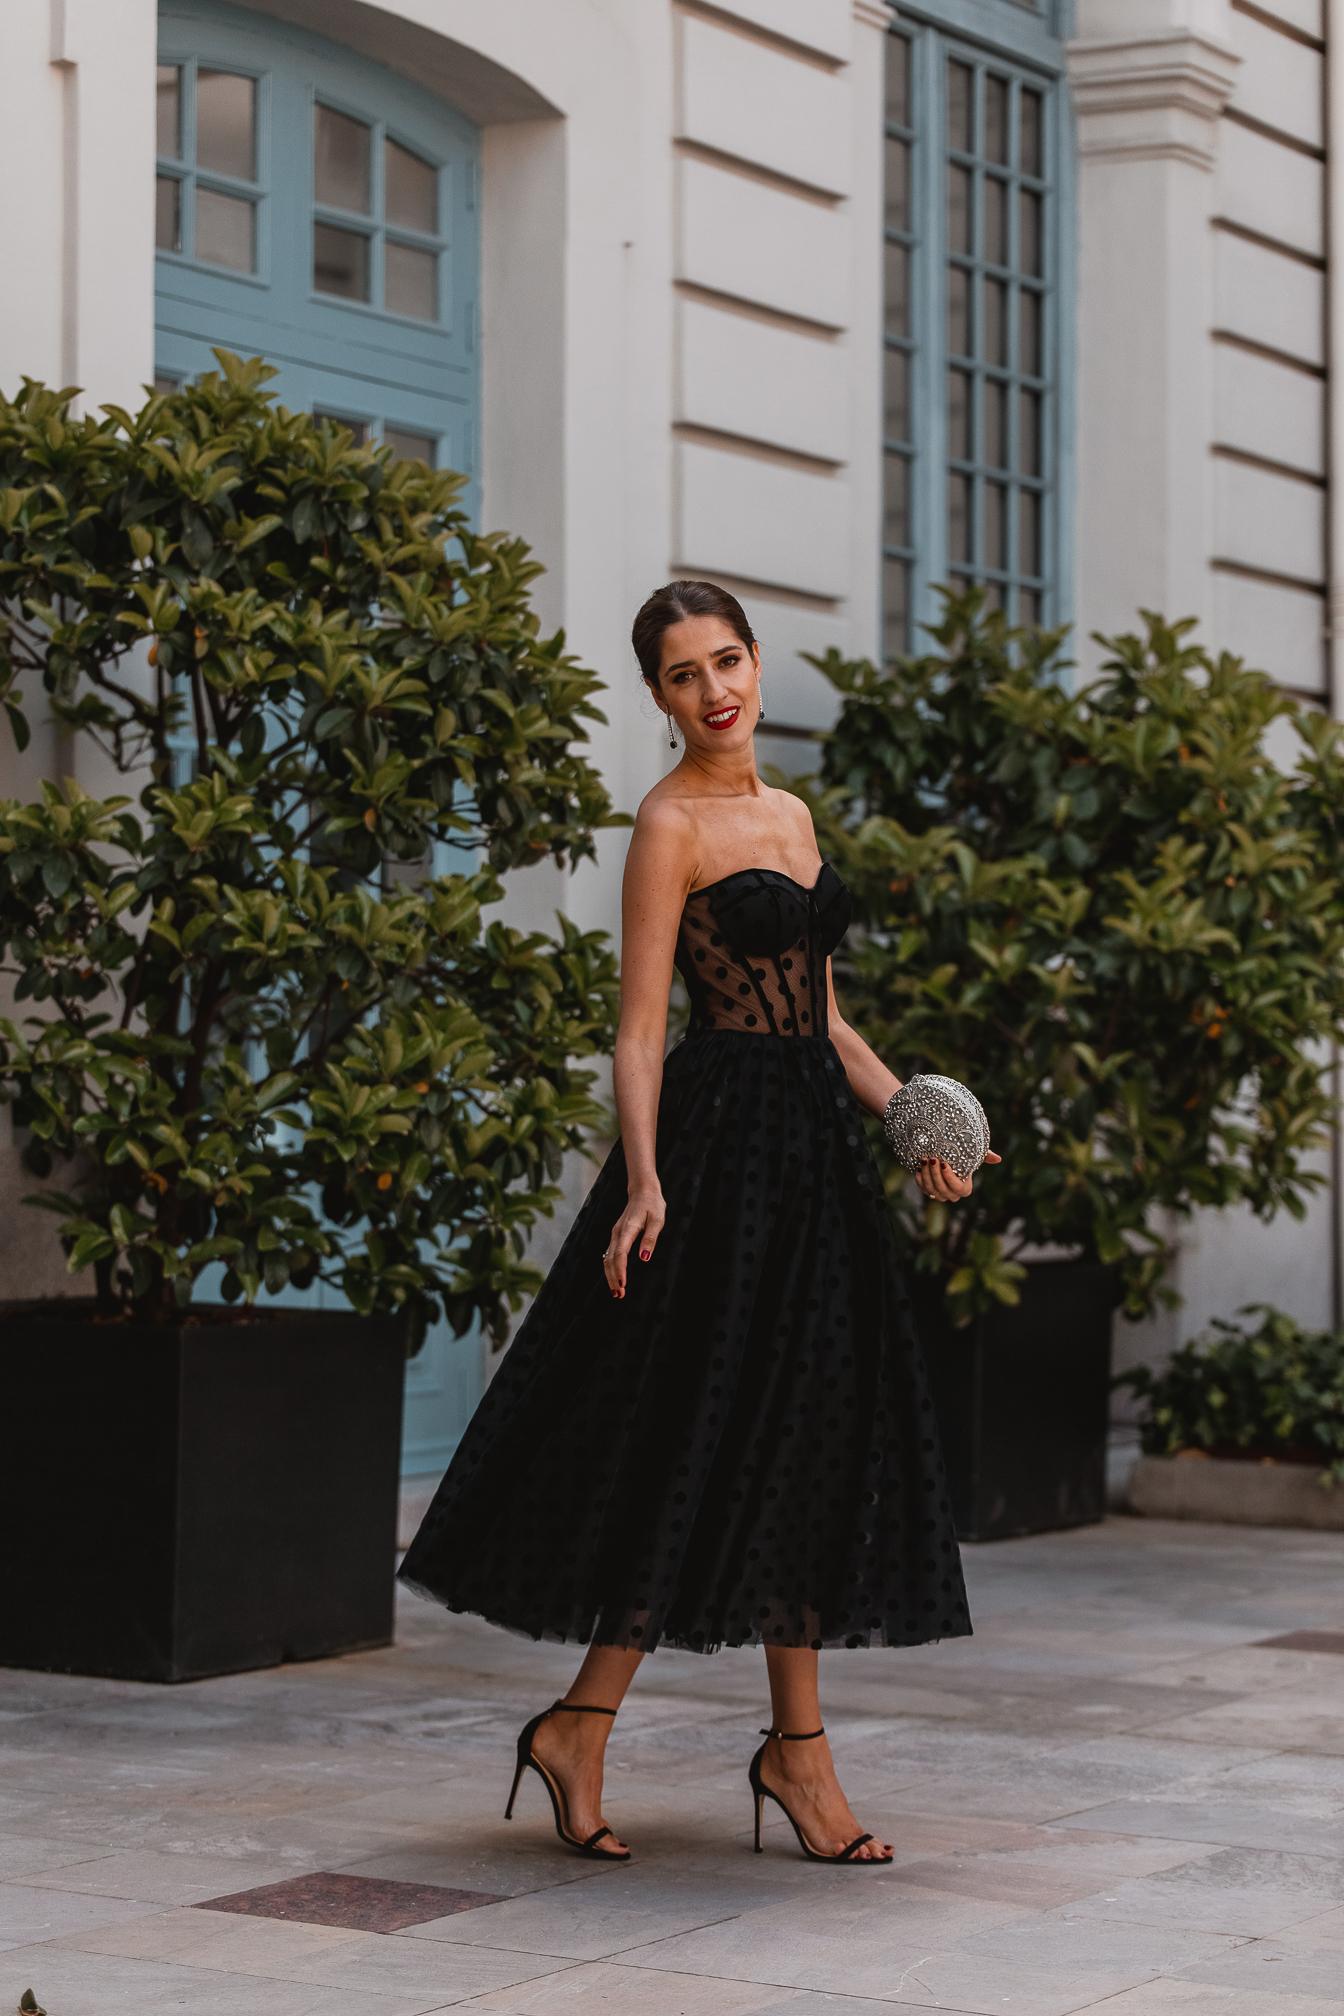 look invitada noche vestido negroinvitada perfecta vestido negro falda tul